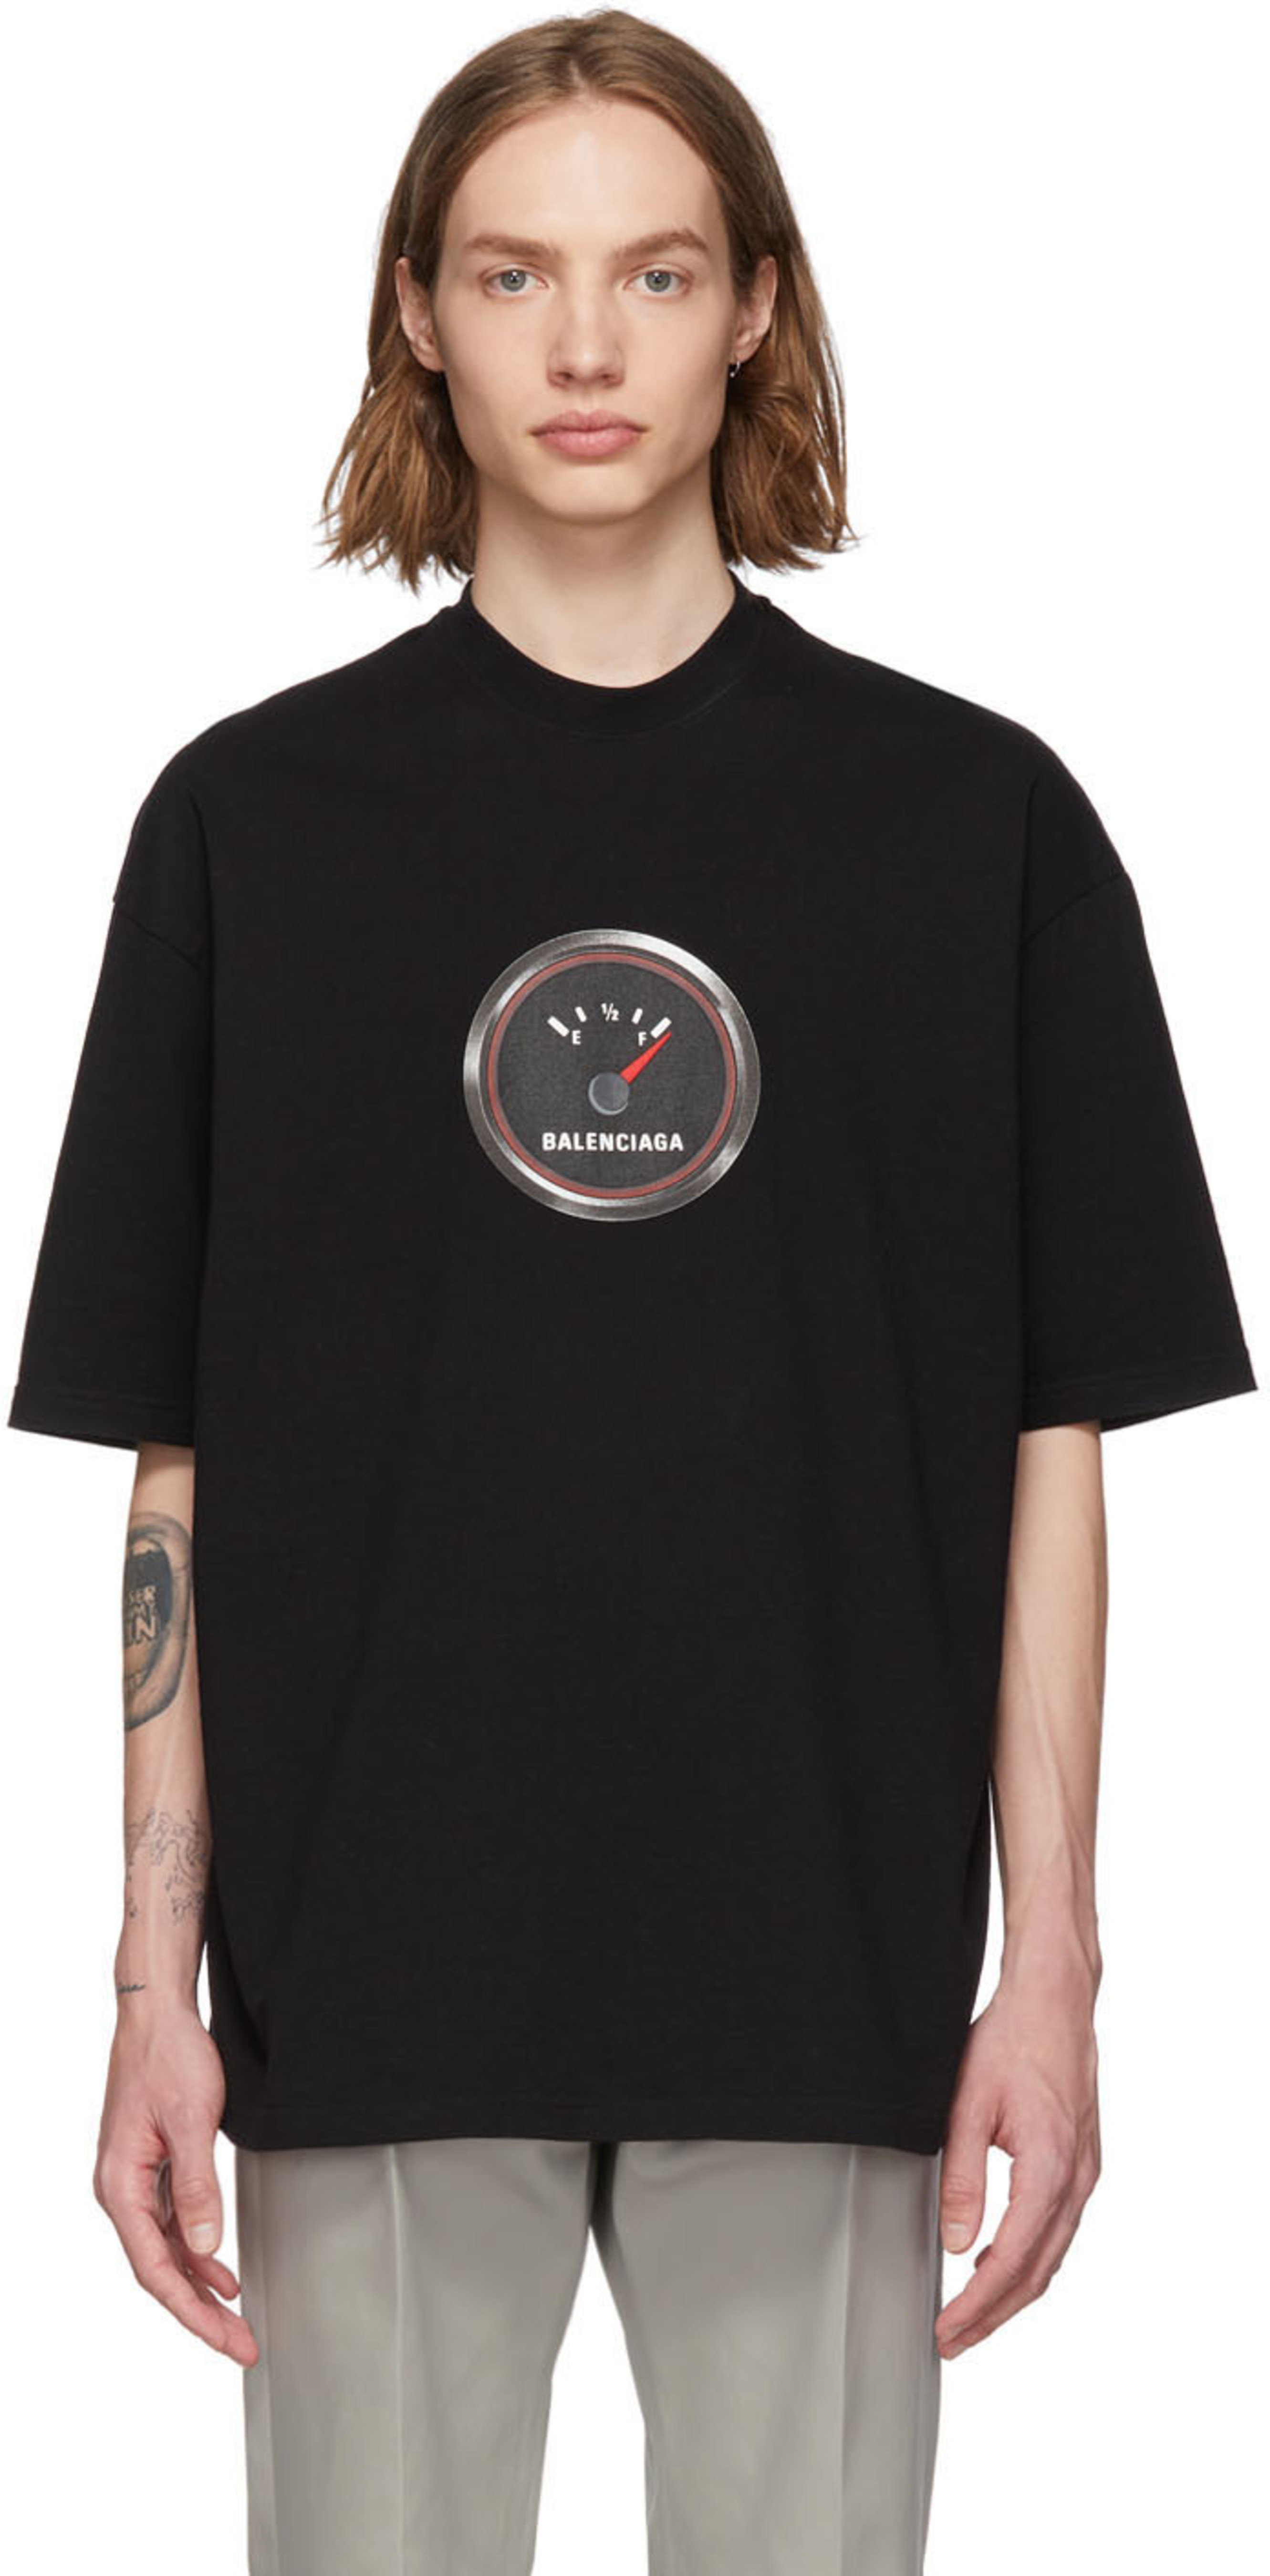 93b55f119 Balenciaga t-shirts for Men | SSENSE UK